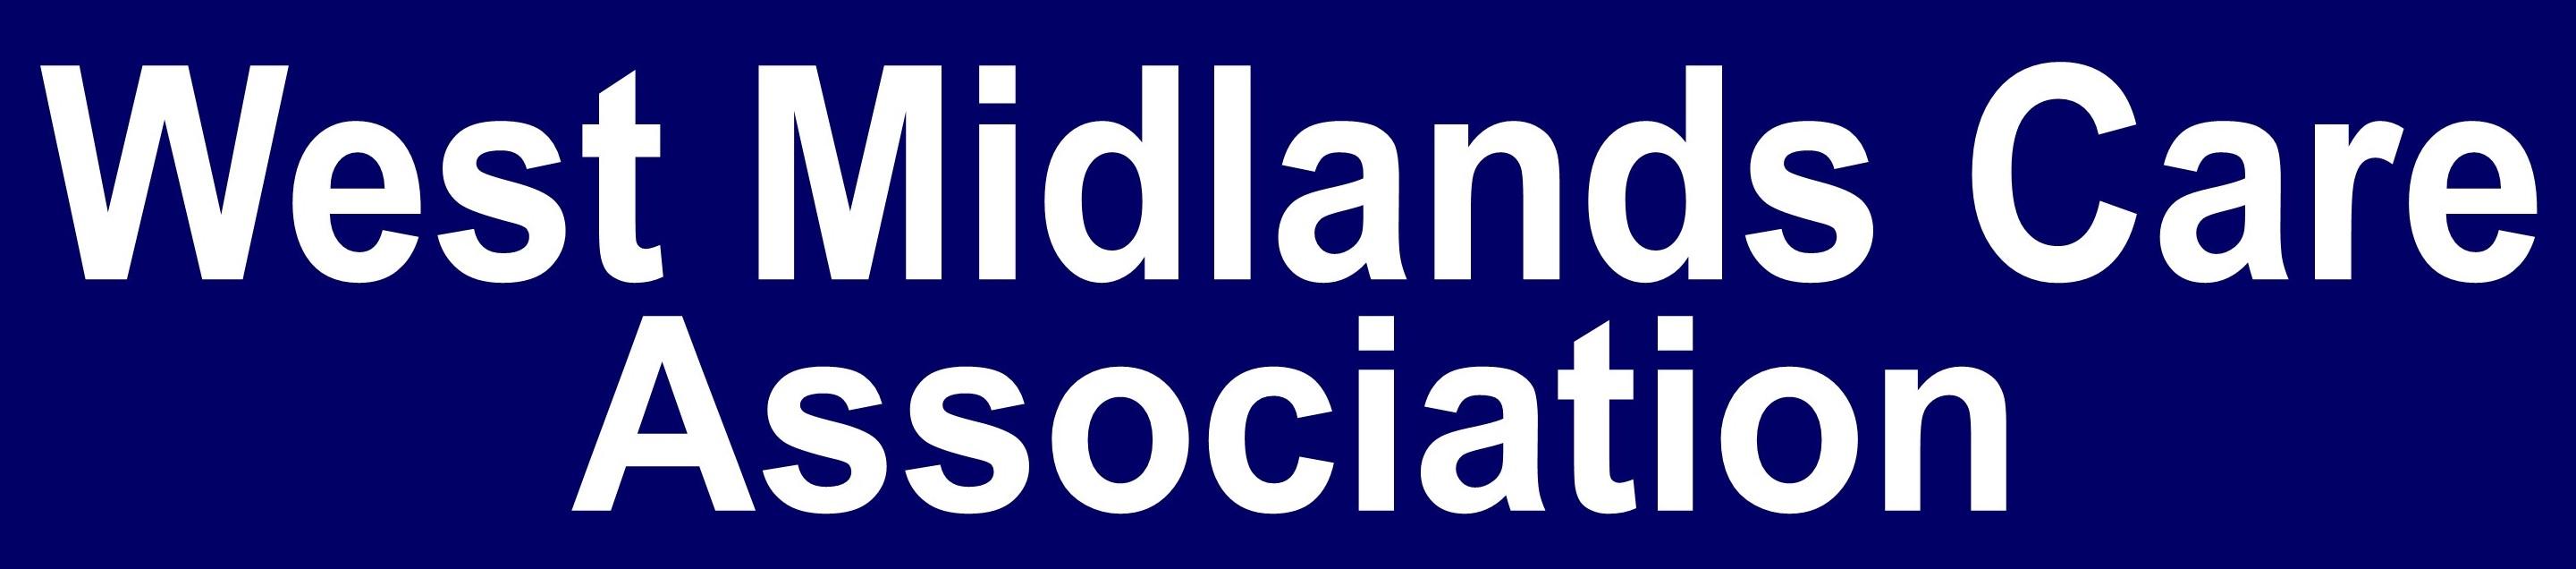 West Midlands Care Association awad